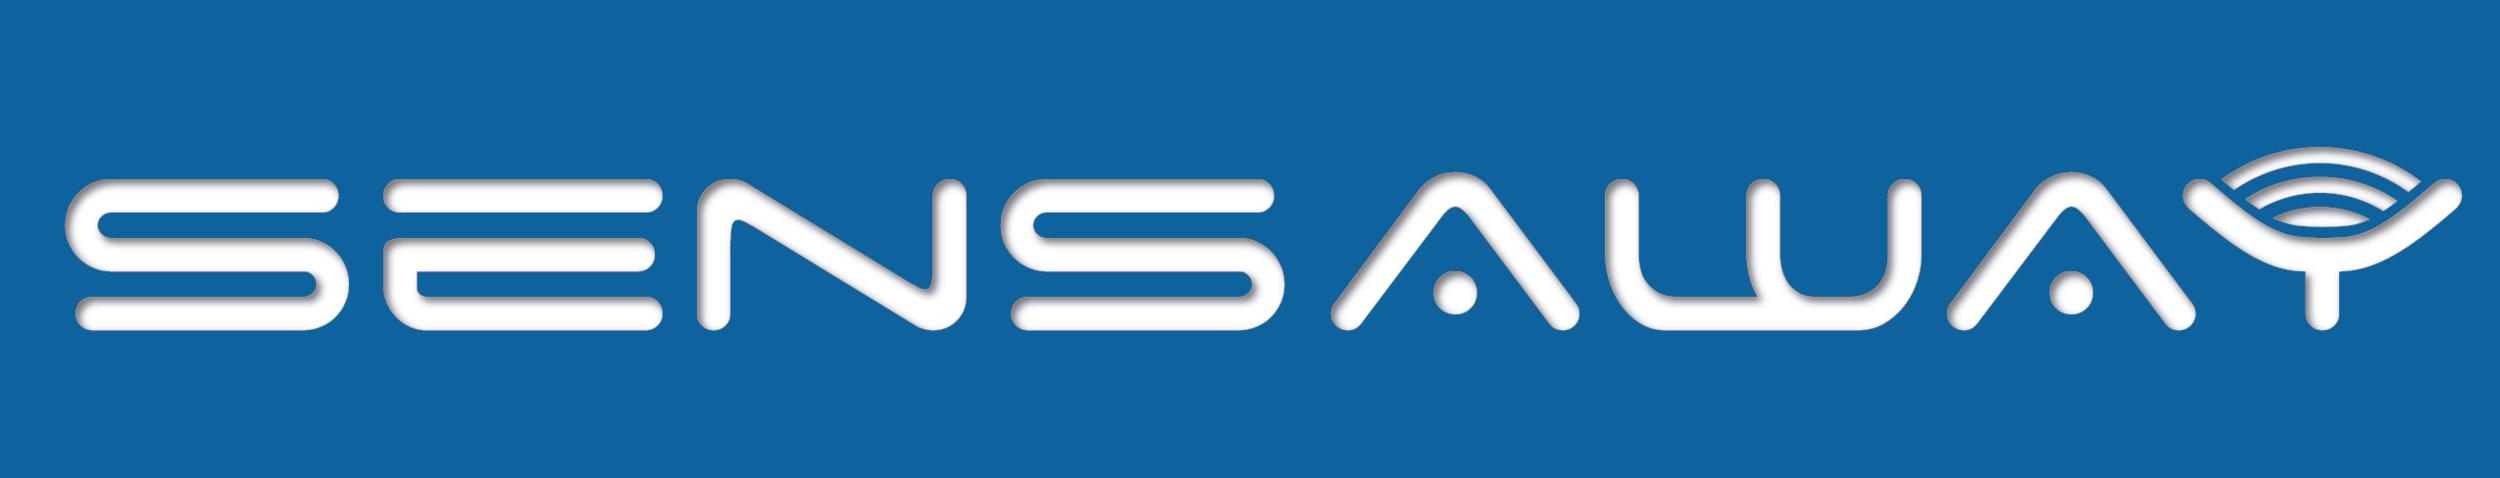 Sensaway_final_Blue (1).png